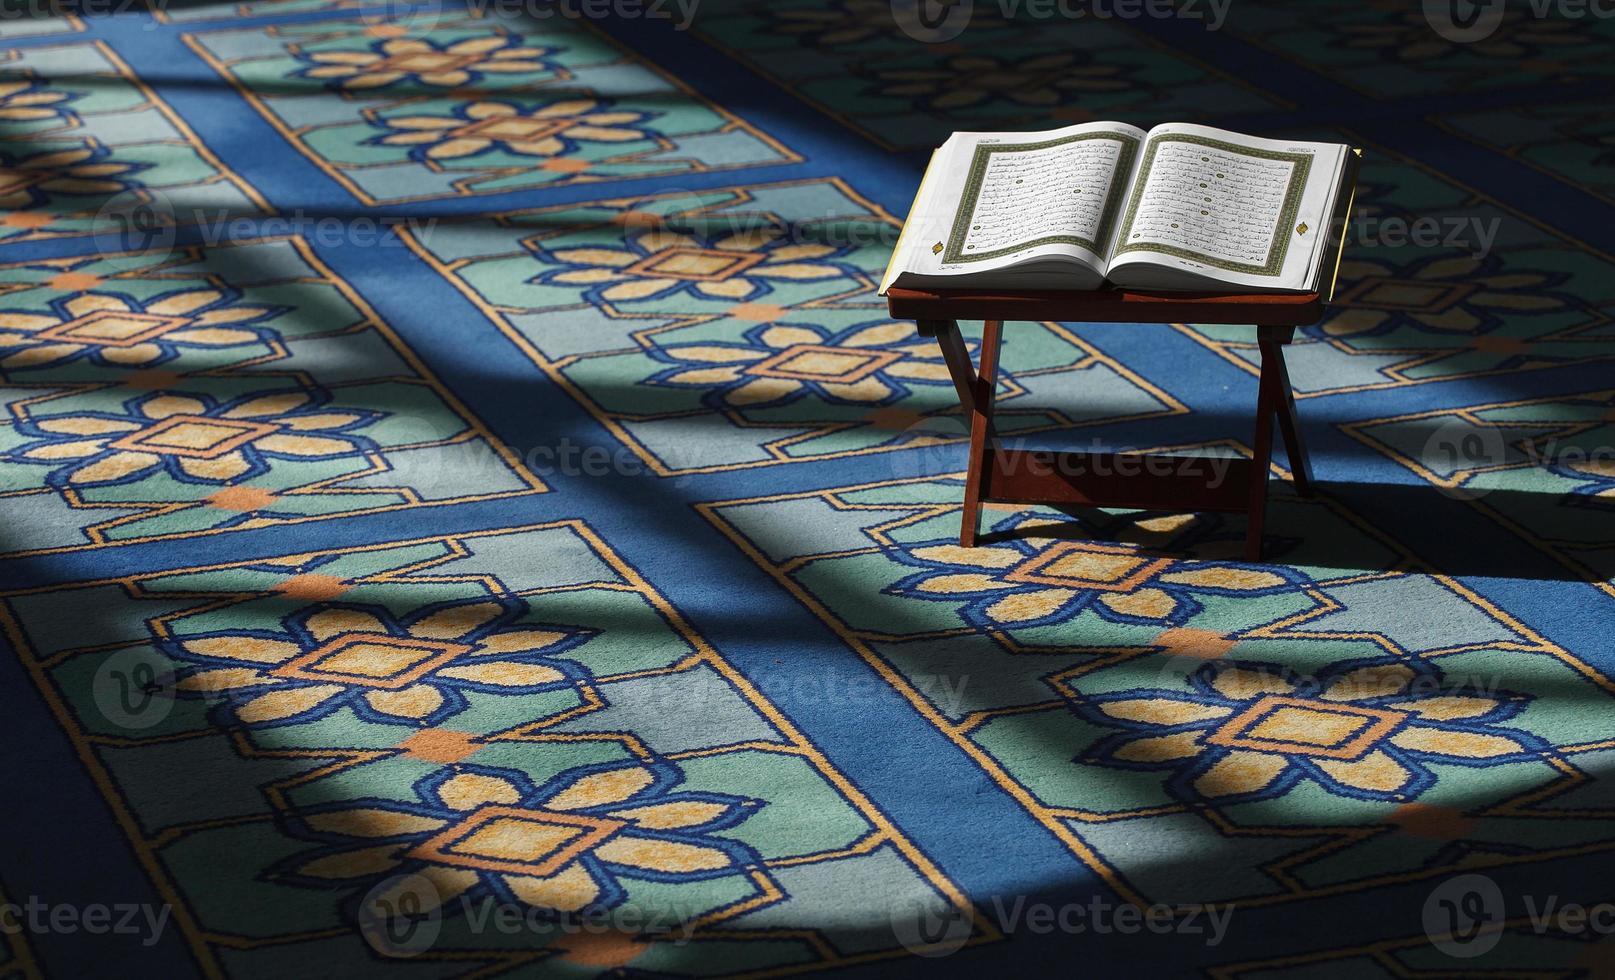 Corán en la mezquita foto